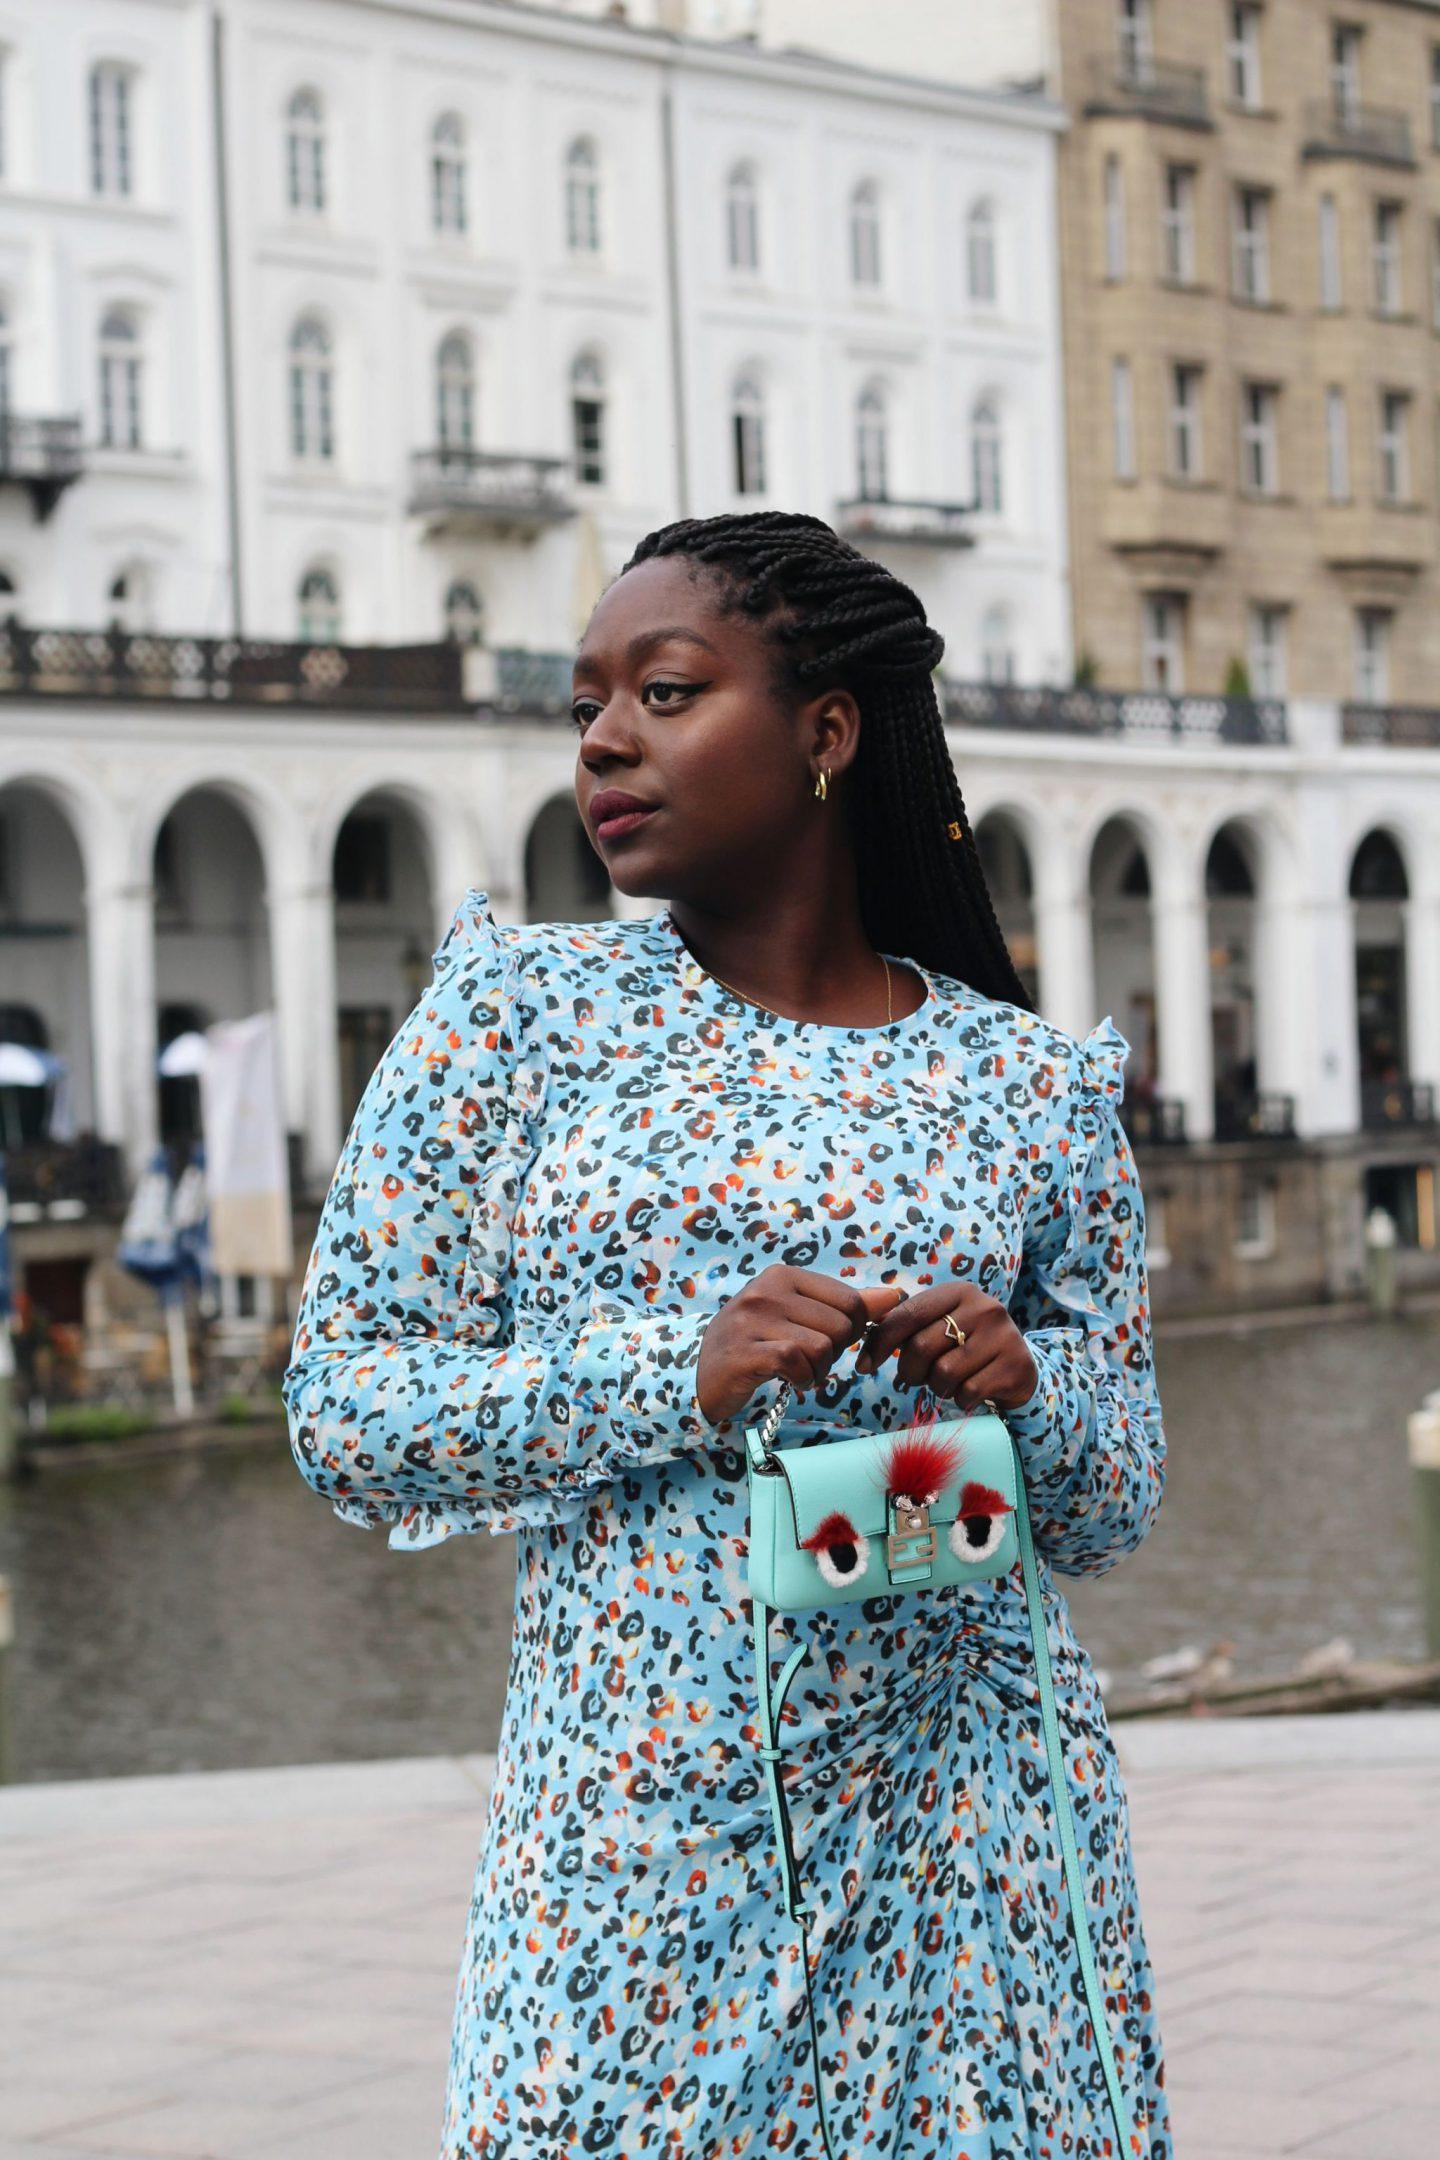 Lala_Berlin_Streetstyle_Lois_Opoku_Fashion_Blogger_Fendi_Monster_Malone_Souliers_lisforlois_3